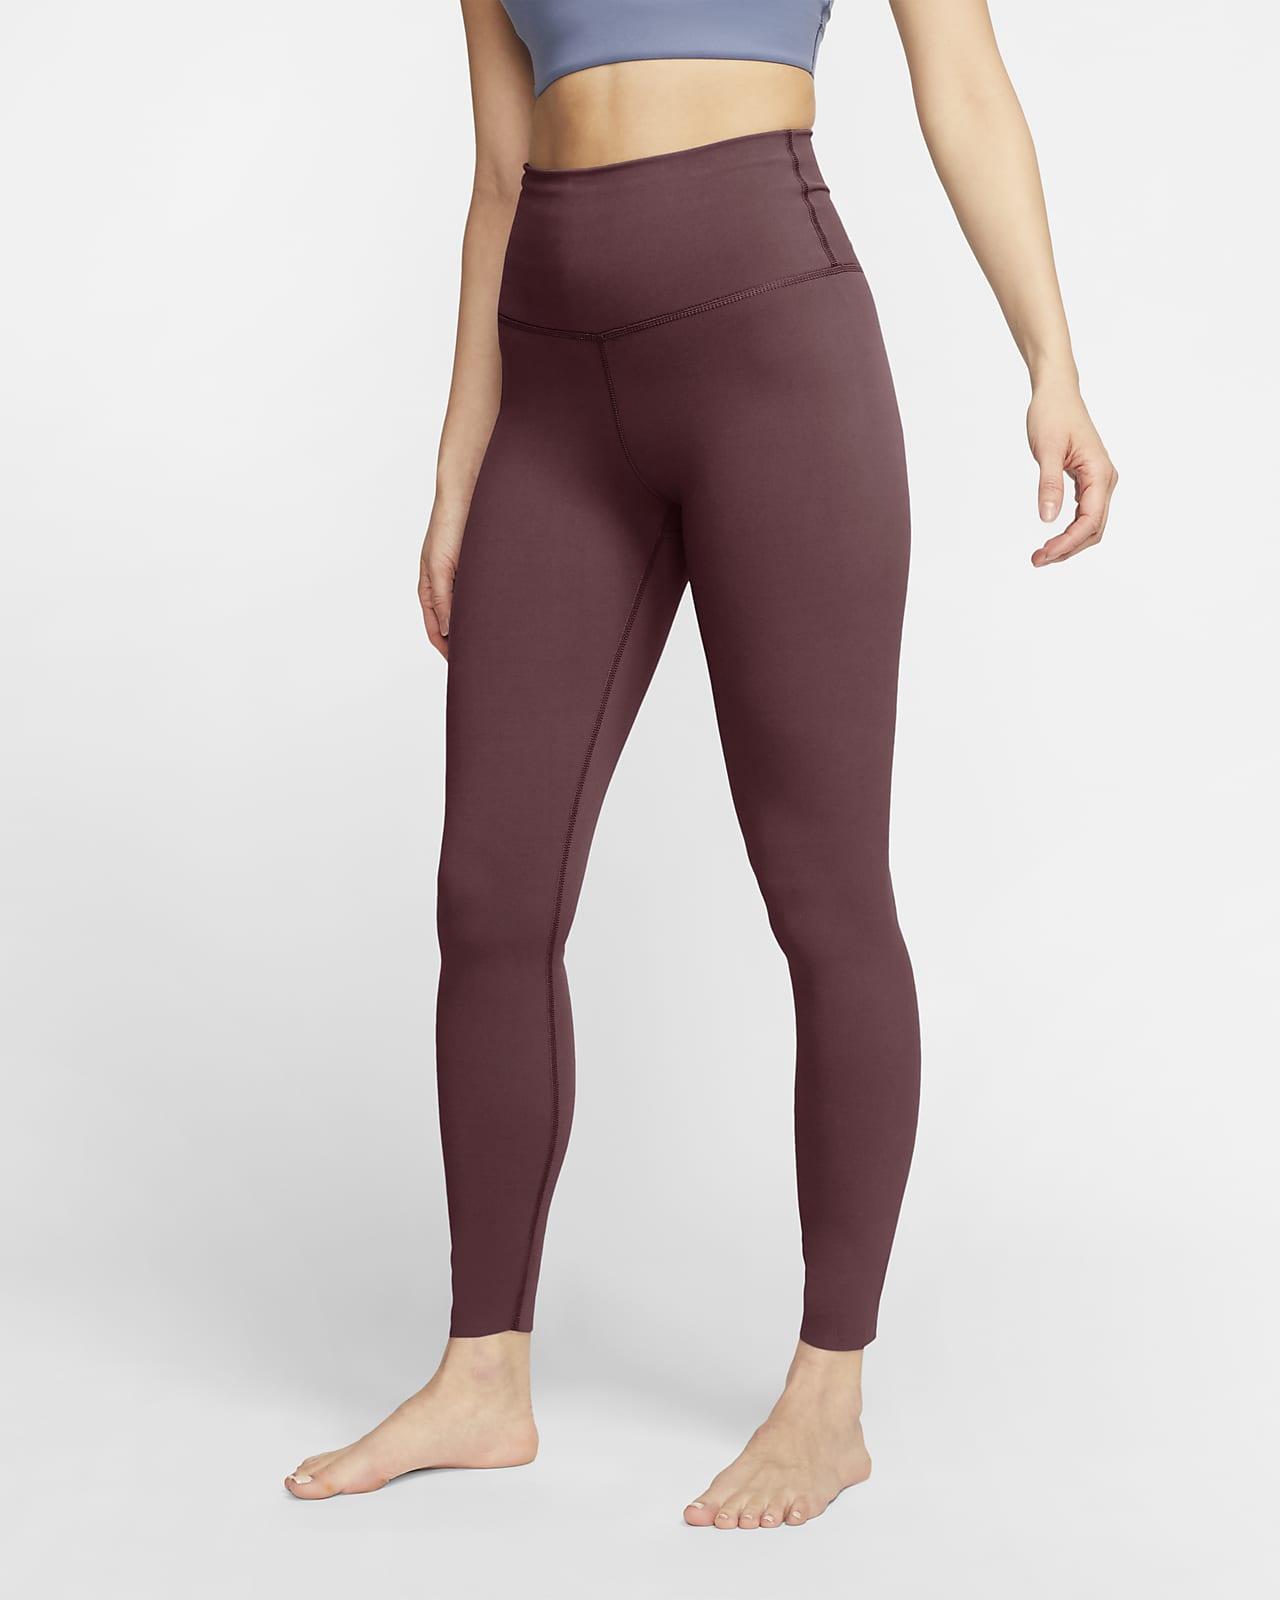 Legging Infinalon 7/8 Nike Yoga Luxe pour Femme